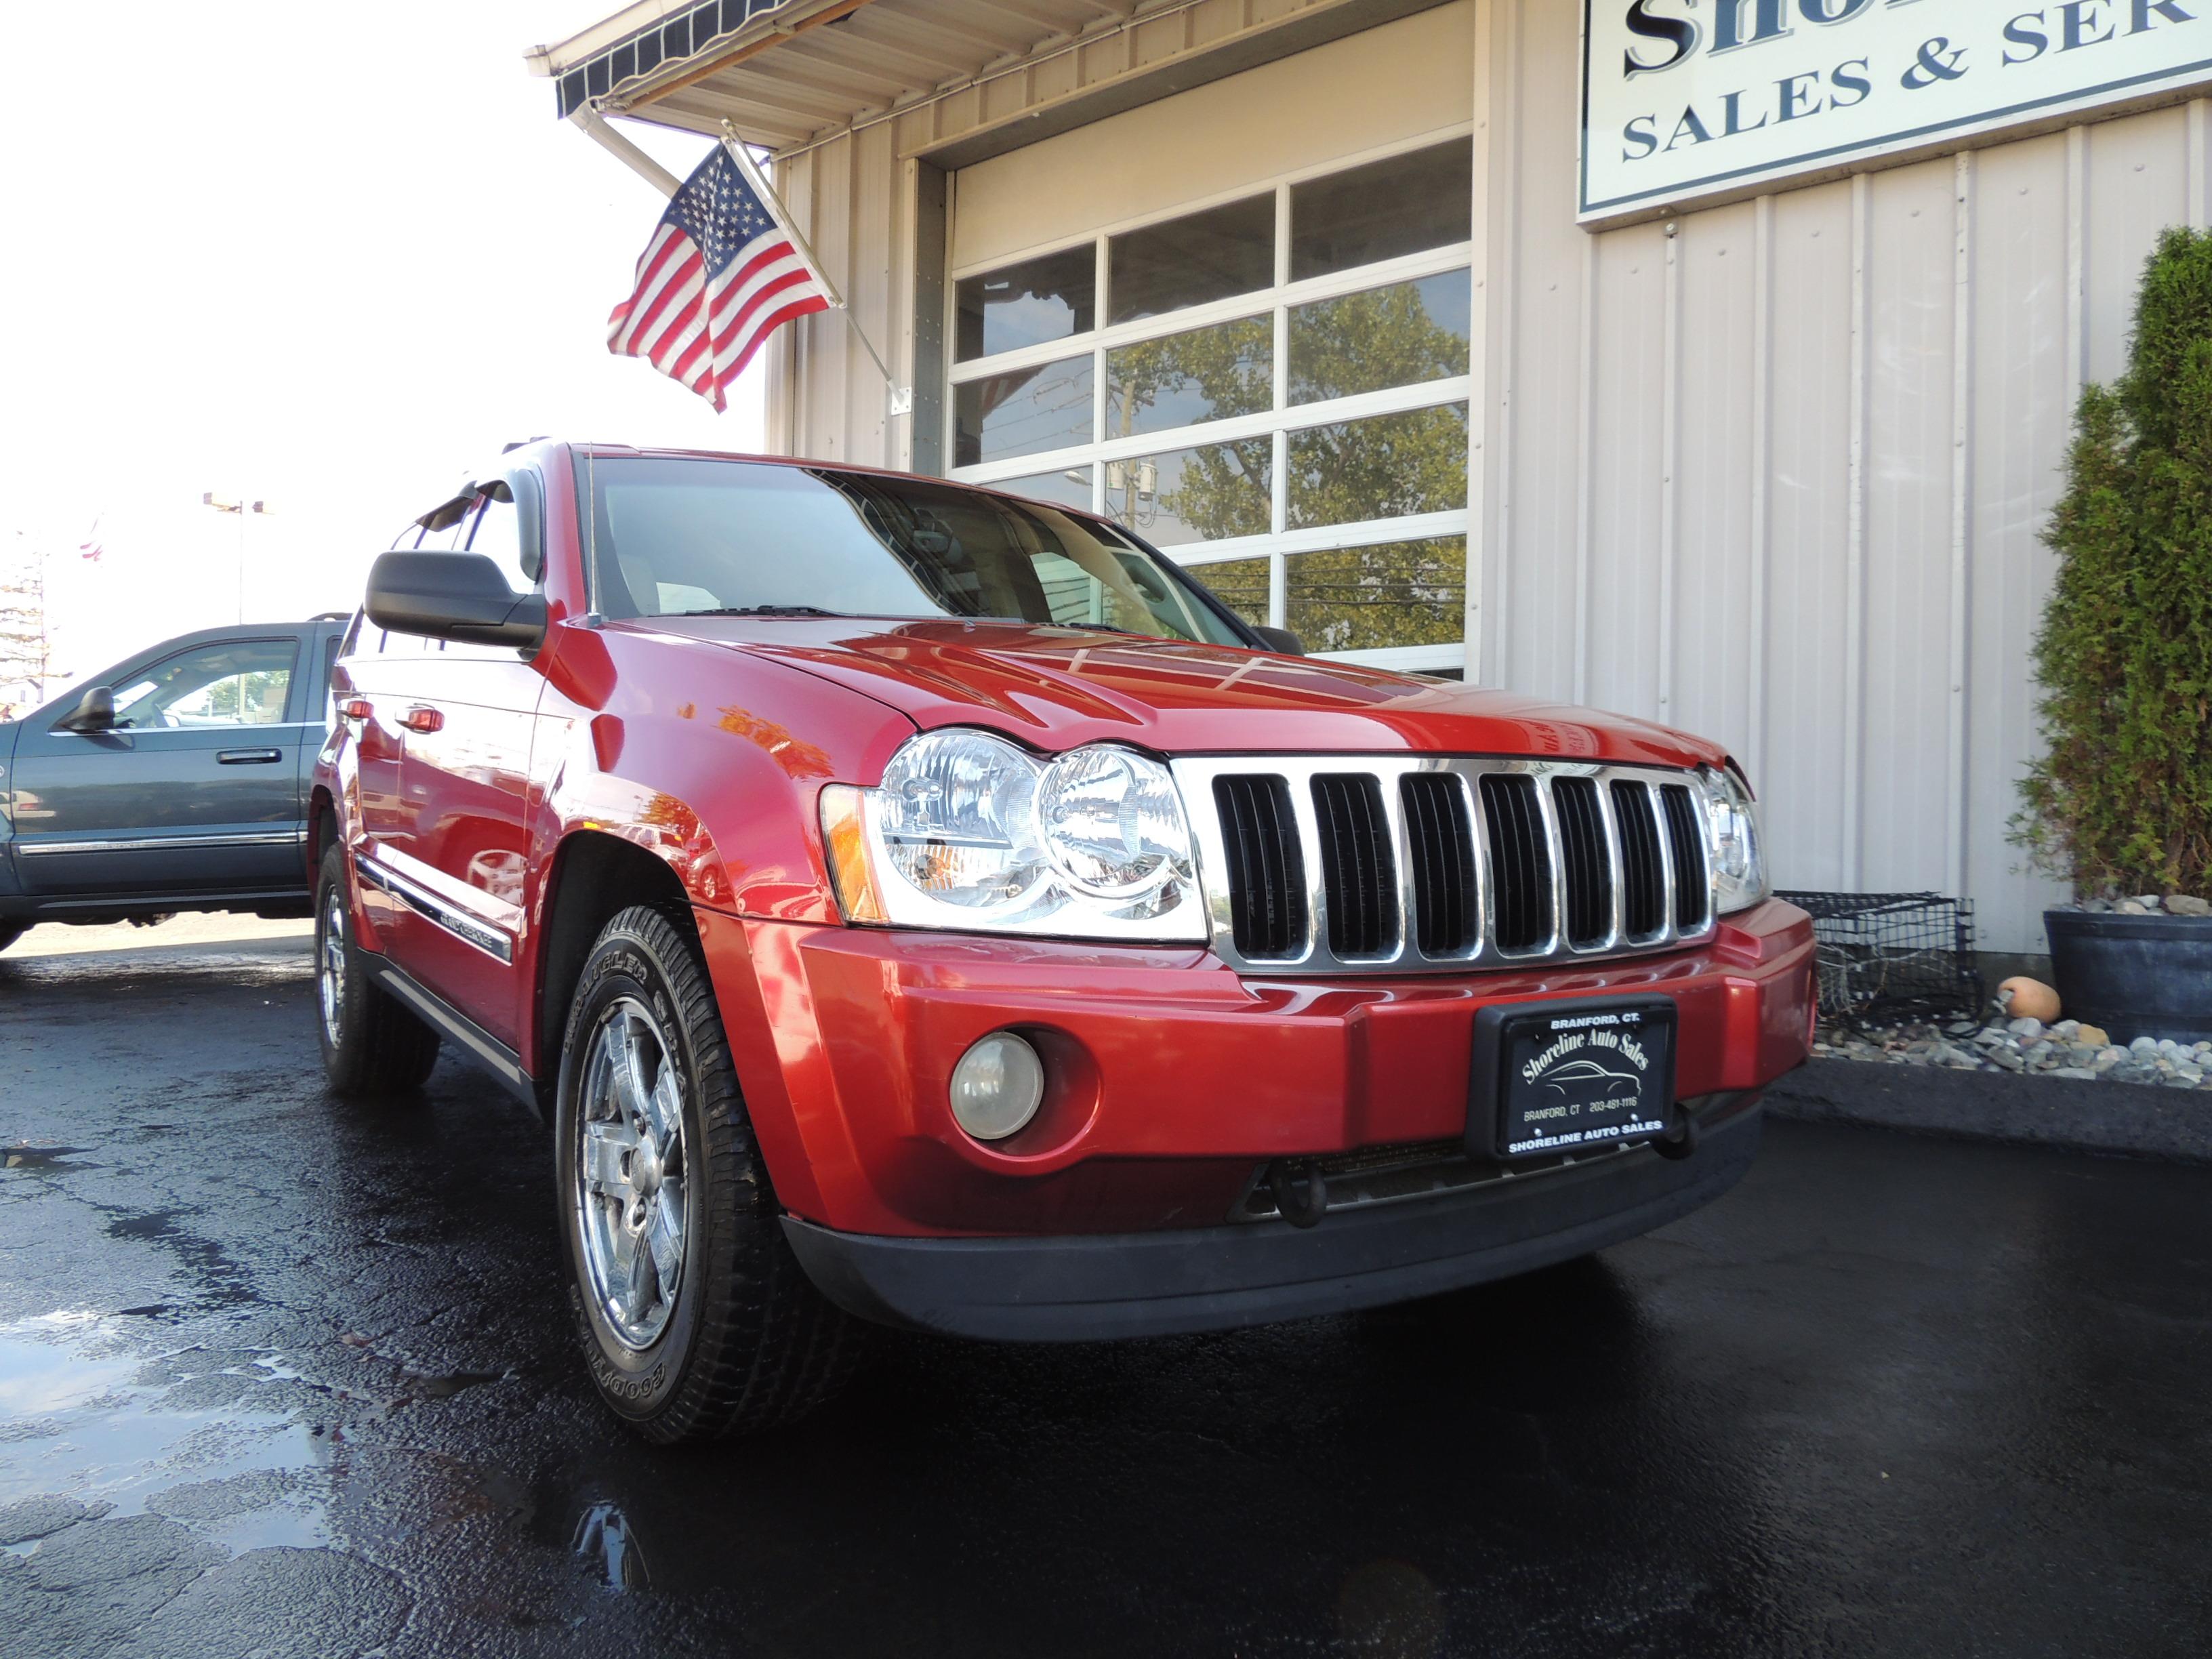 Jeeps For Sale In Ct >> 2005 Jeep Grand Cherokee Limited 5.7L HEMI | Shoreline Auto Sales